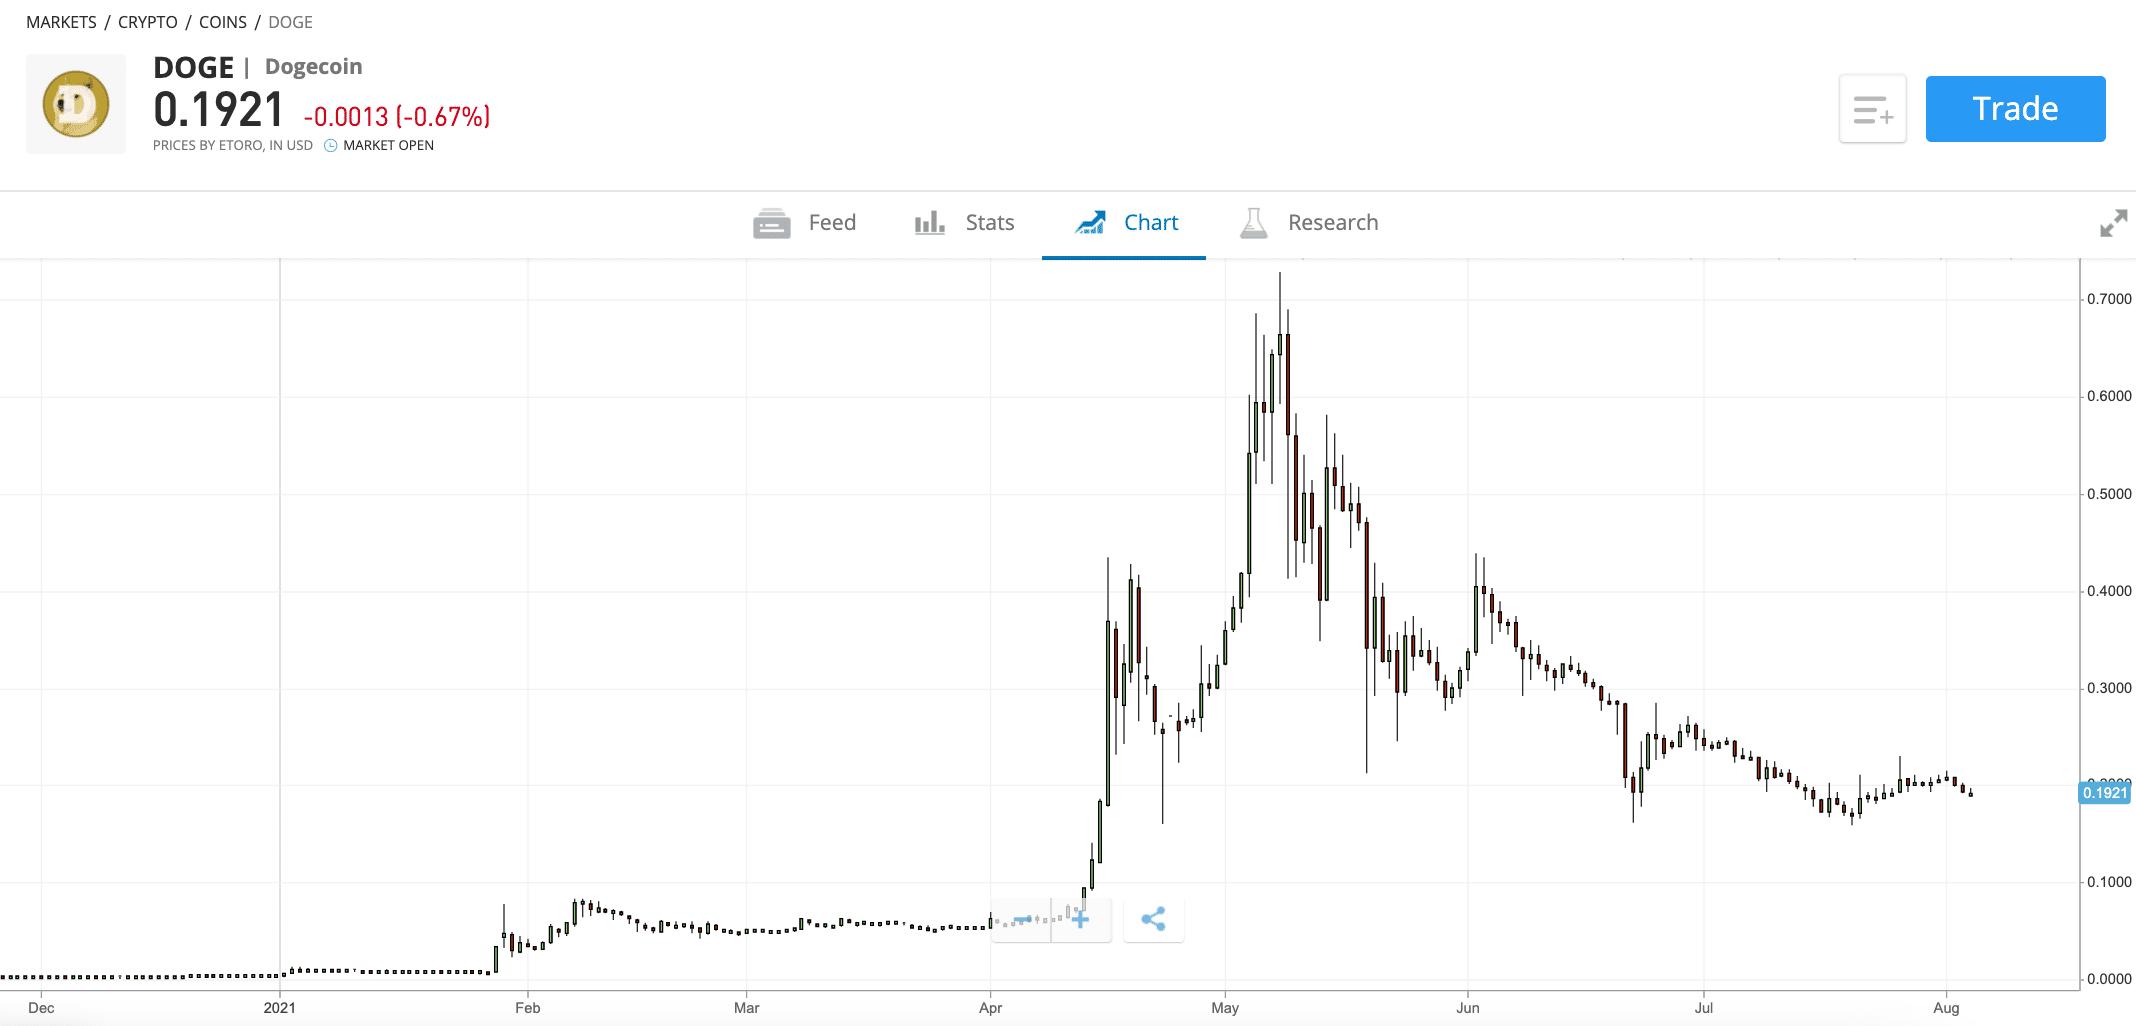 etoro dogecoin price chart